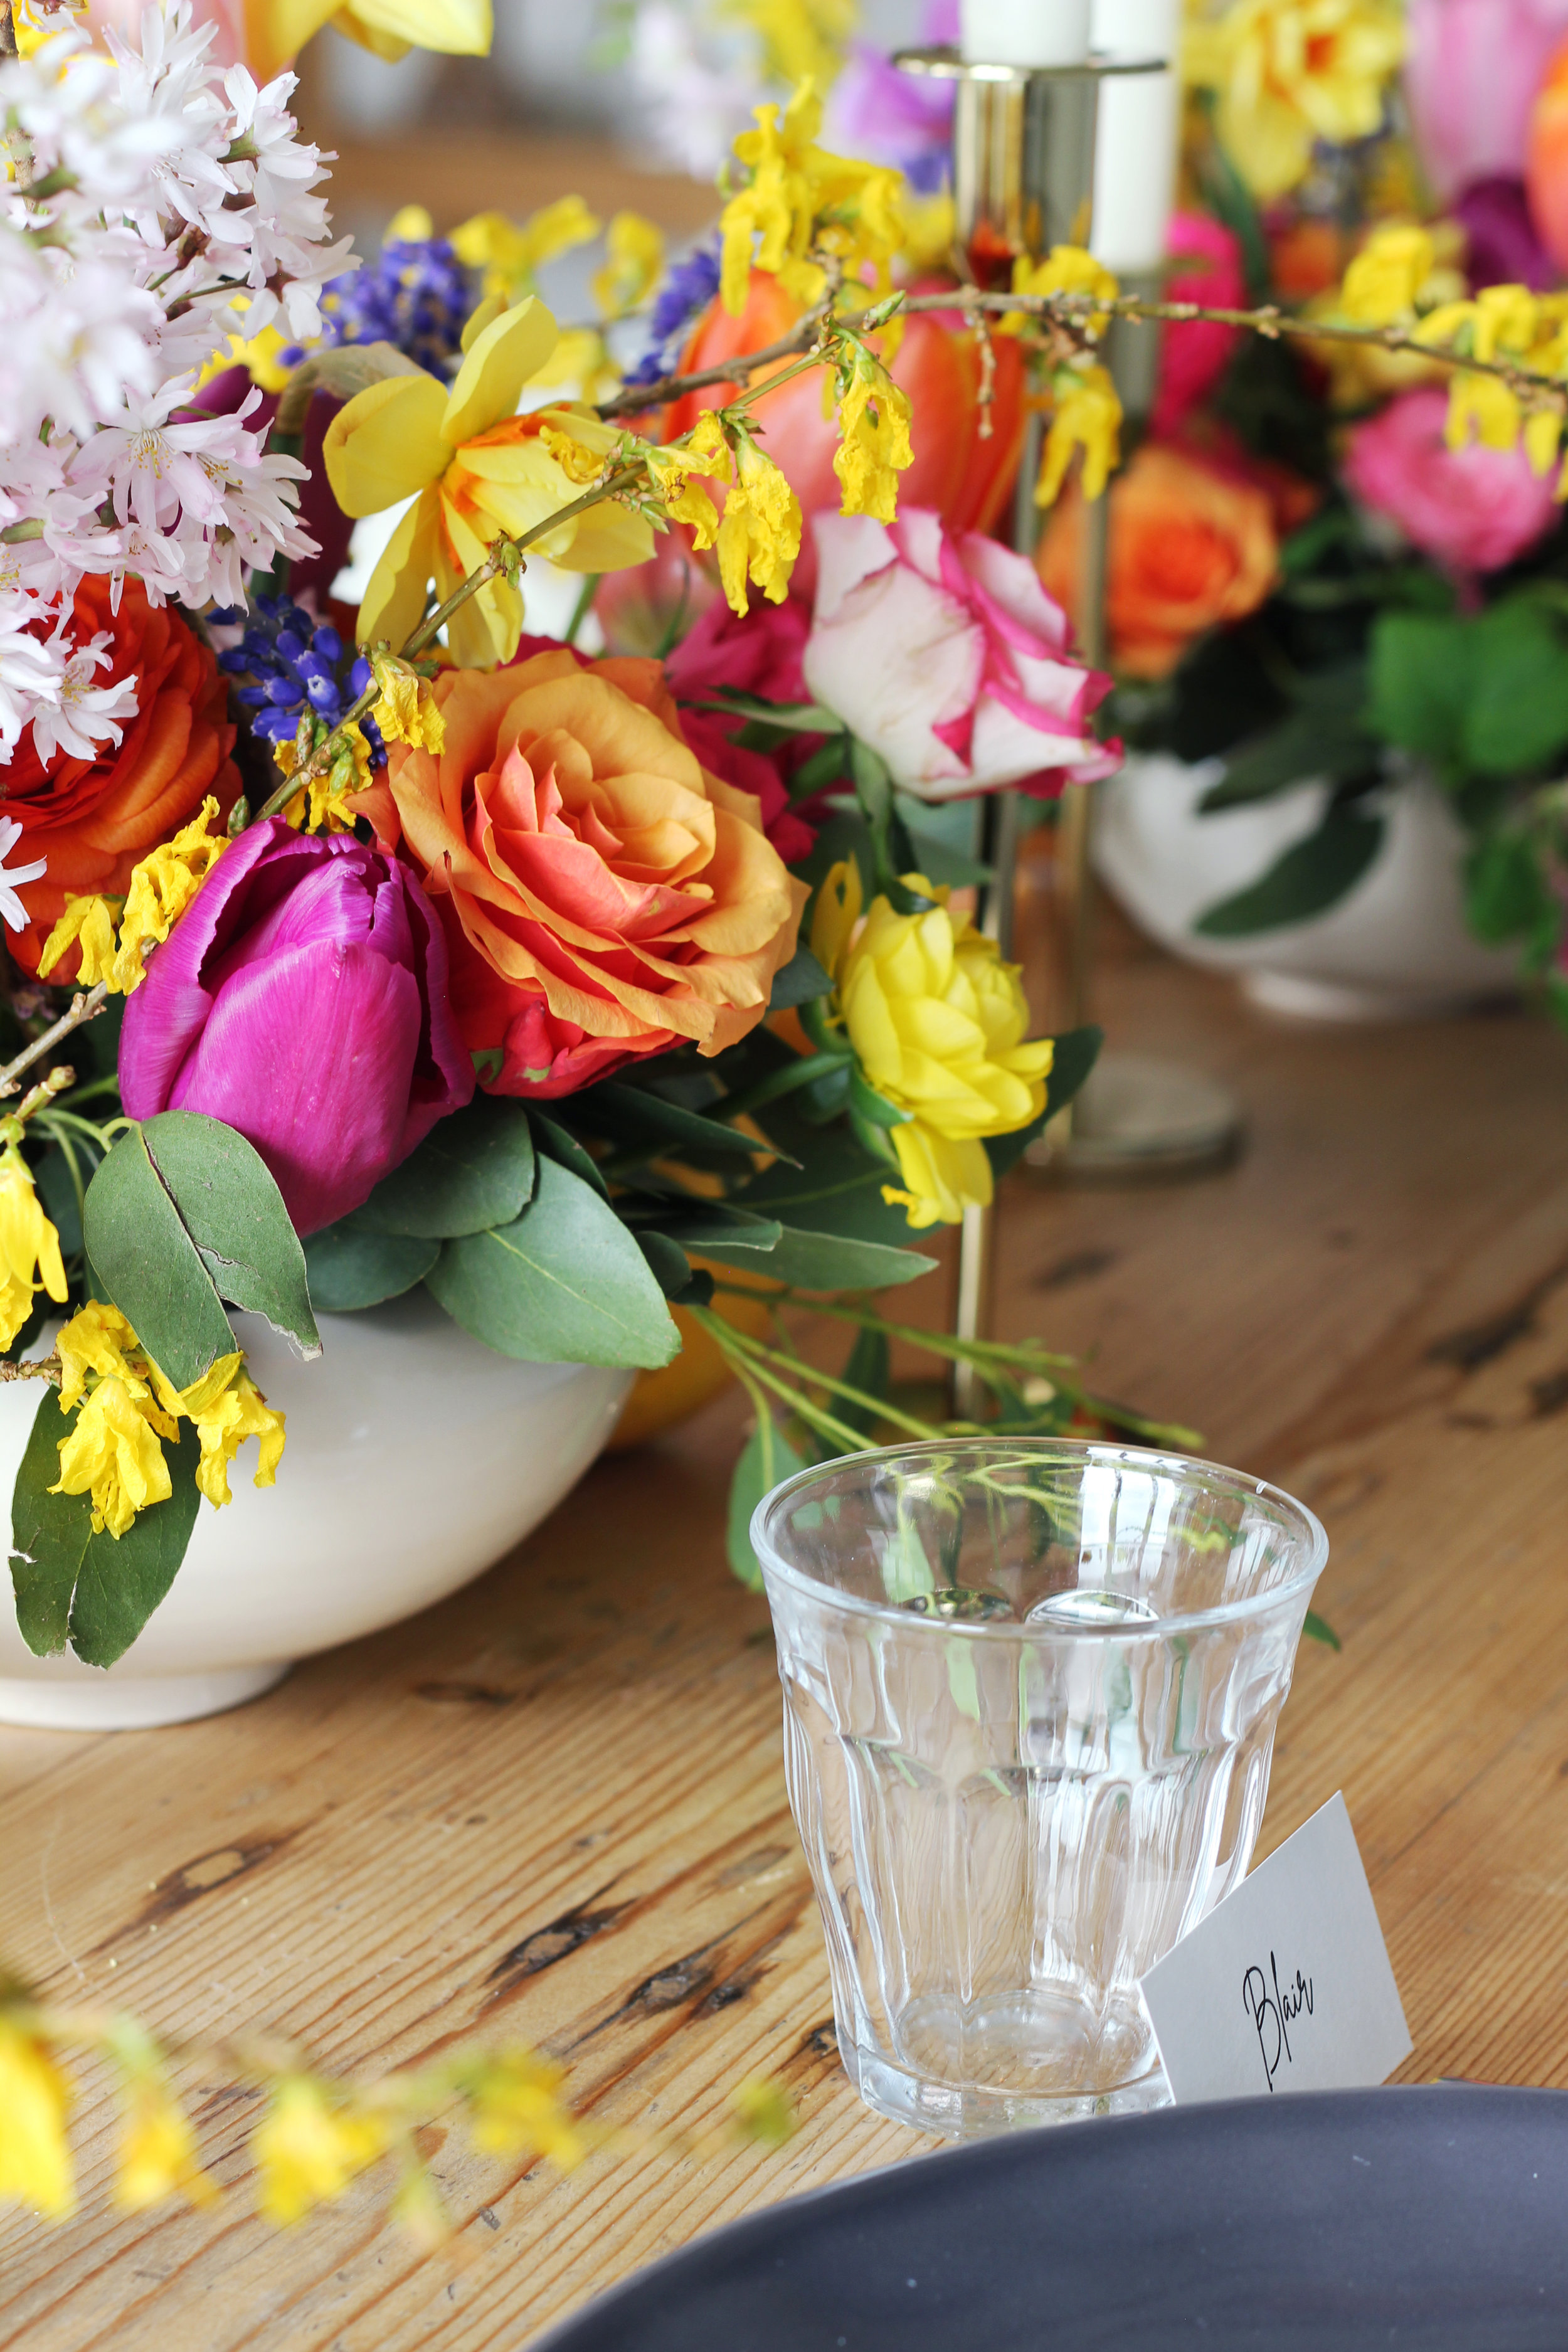 Callie-Pettigrew-Fruity-Florals-20.jpg